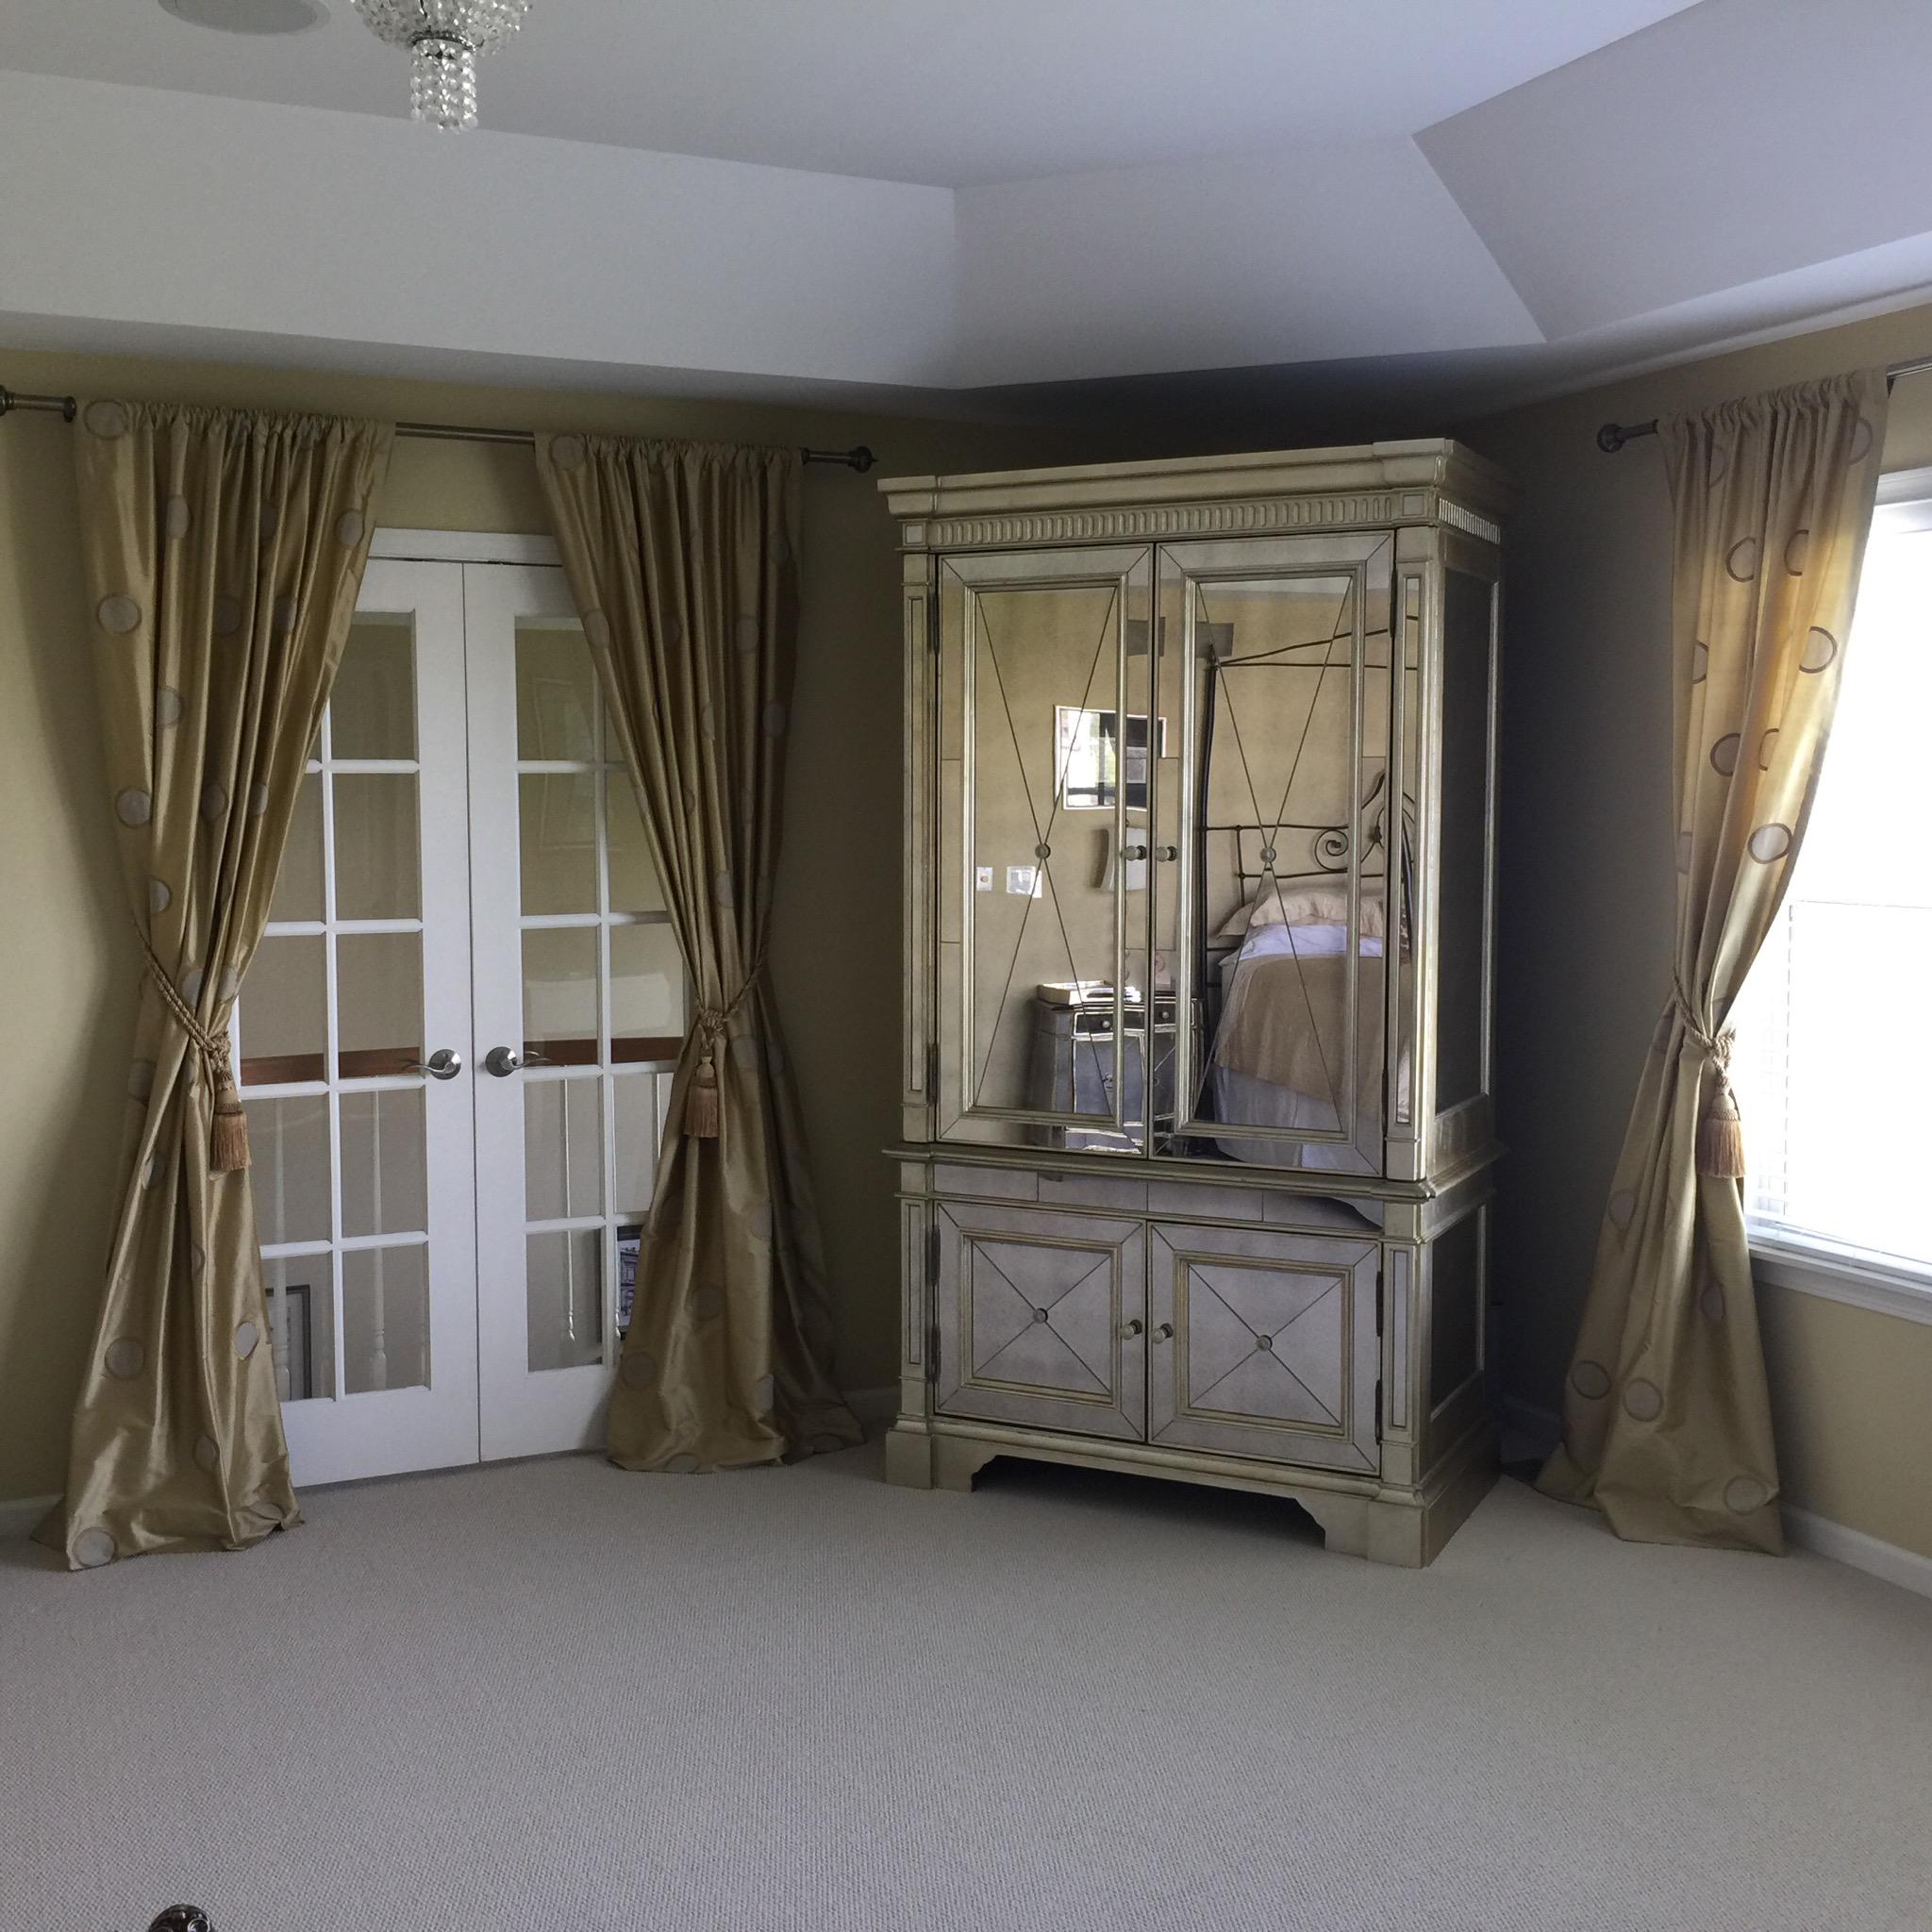 Mirrored vanity at angle 1.jpg